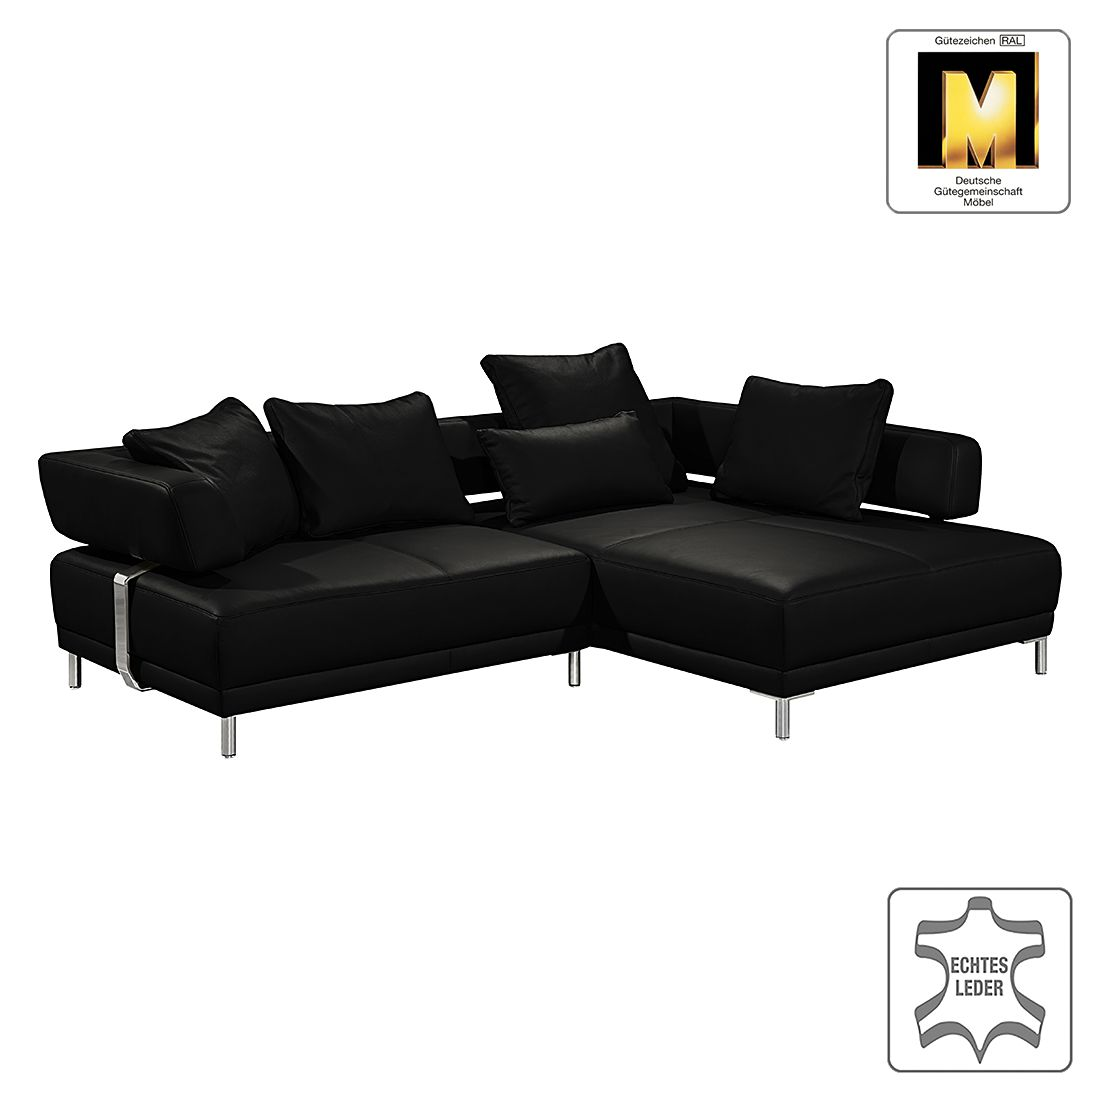 ecksofa casual line ii echtleder longchair ottomane davorstehend rechts manueller. Black Bedroom Furniture Sets. Home Design Ideas